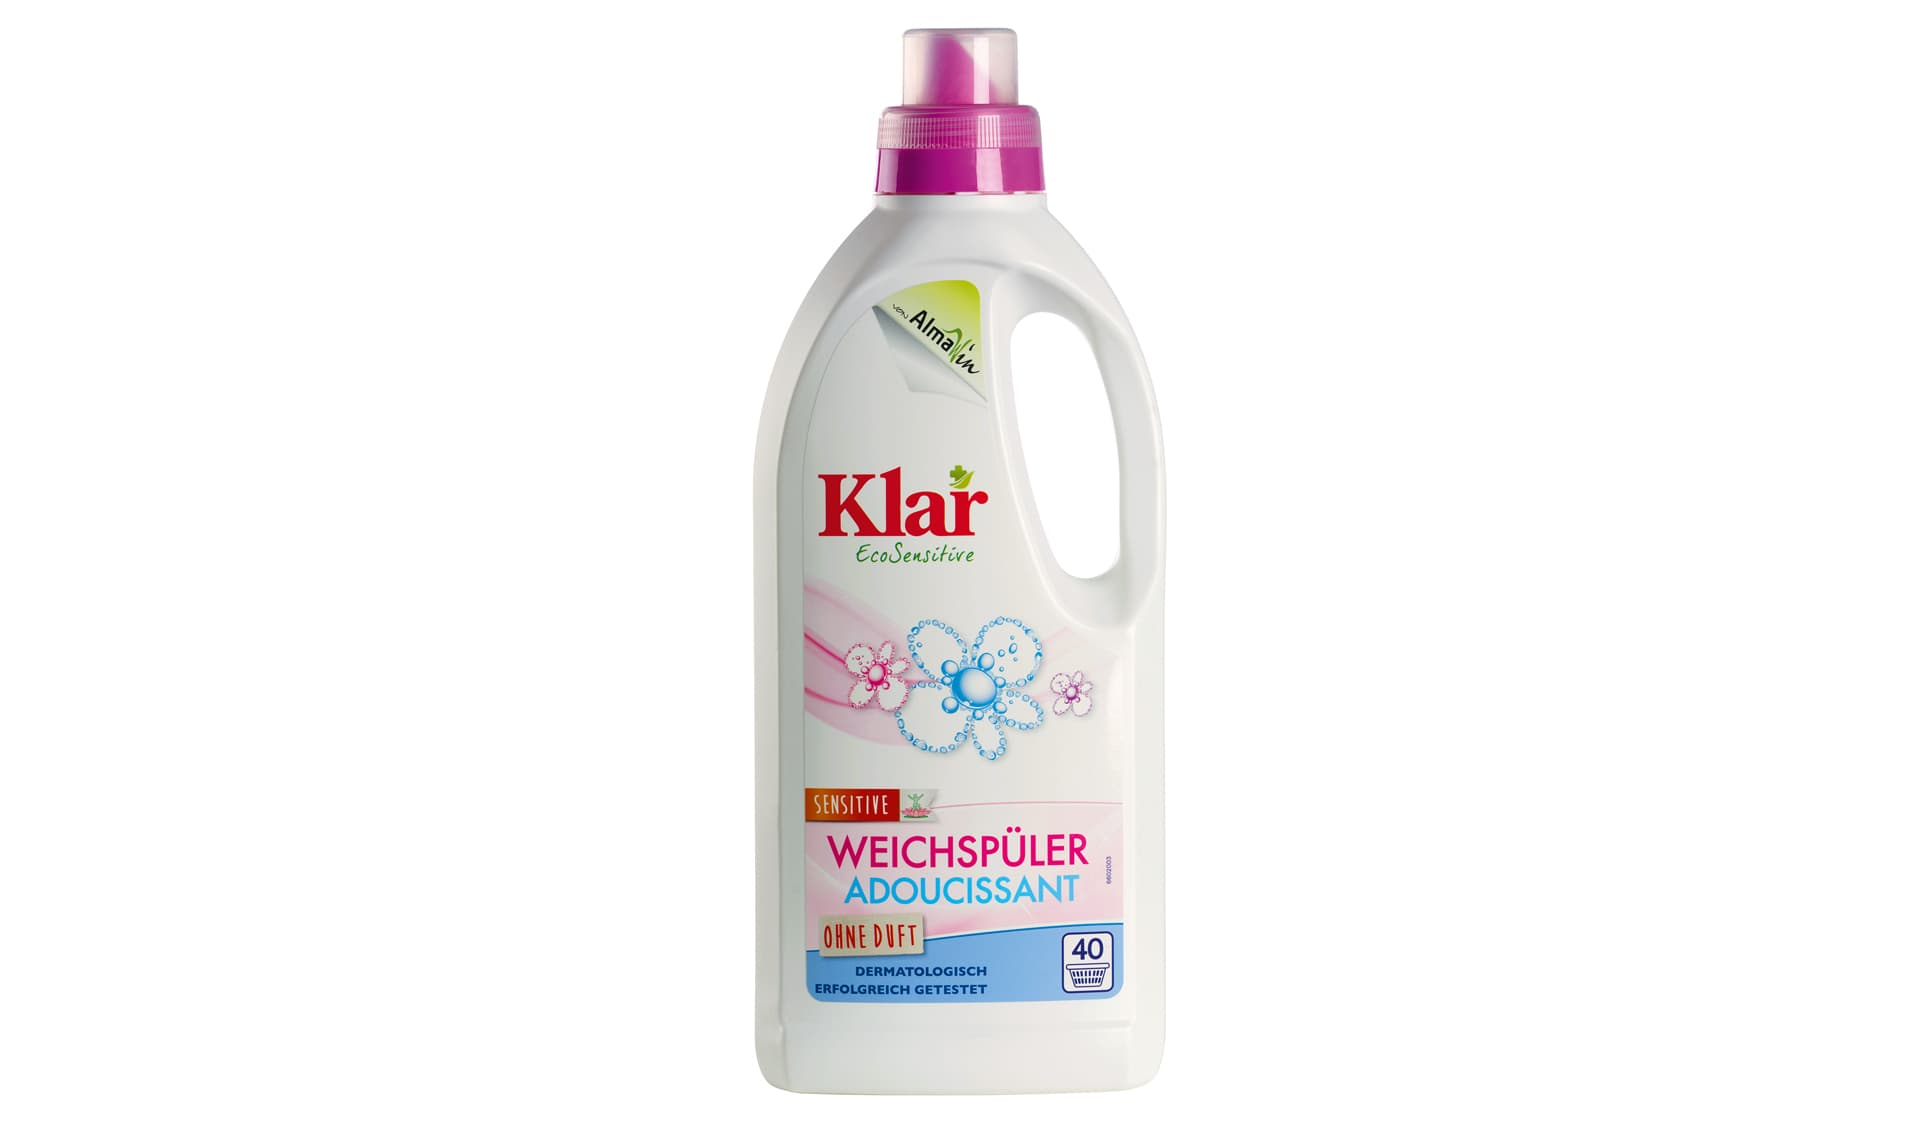 Klar (www.klar.org) Weichspüler